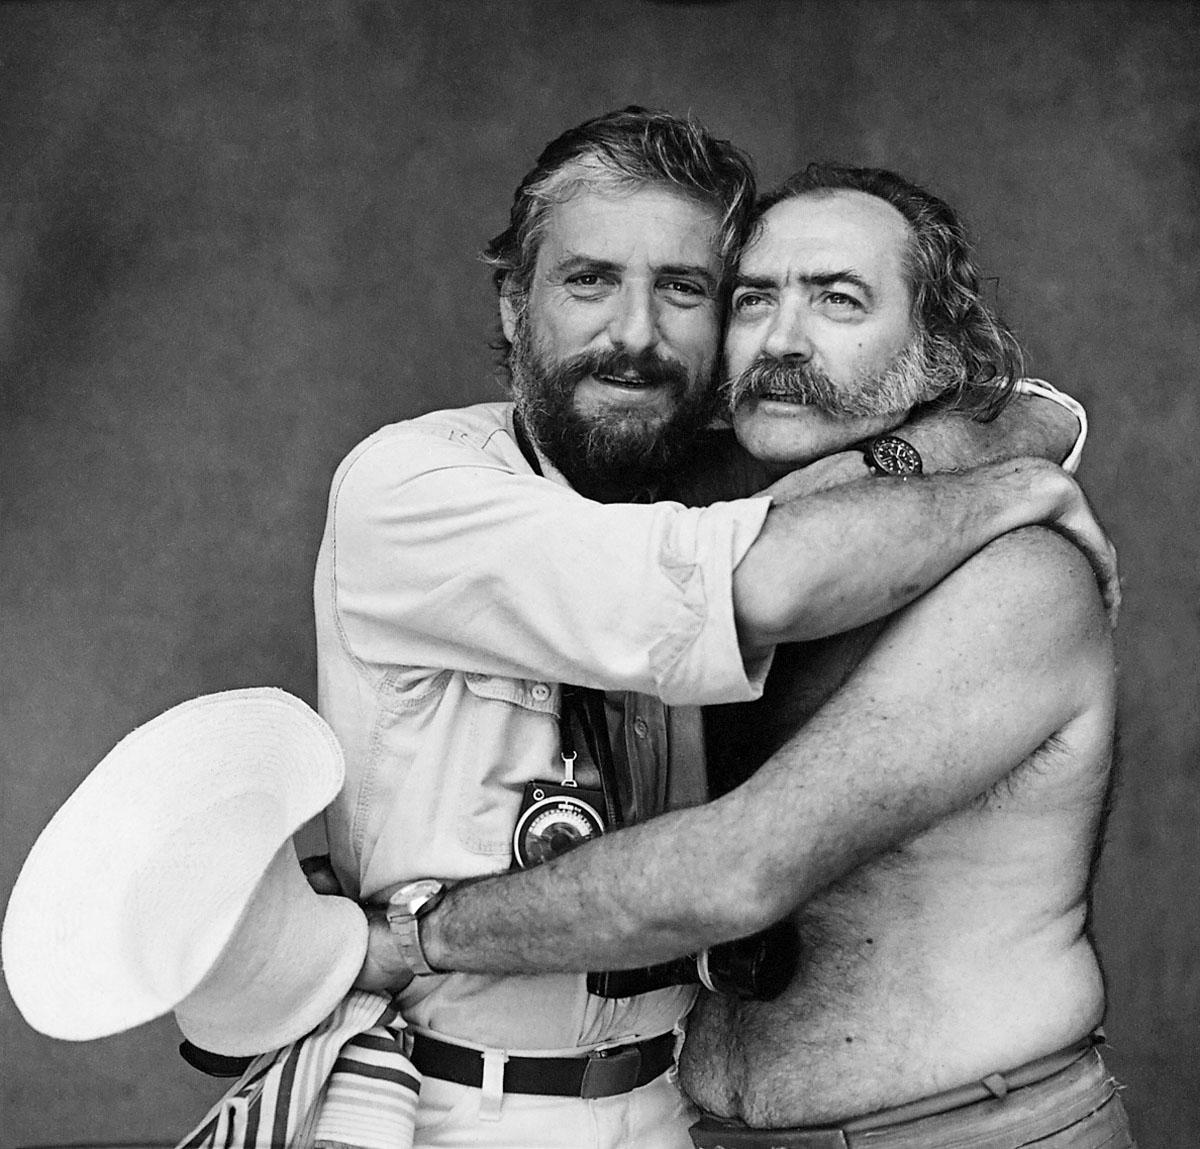 Otto Stupakoff e Mario Cravo Júnior, c. 1980. Foto de Mario Cravo Neto/ Acervo IMS